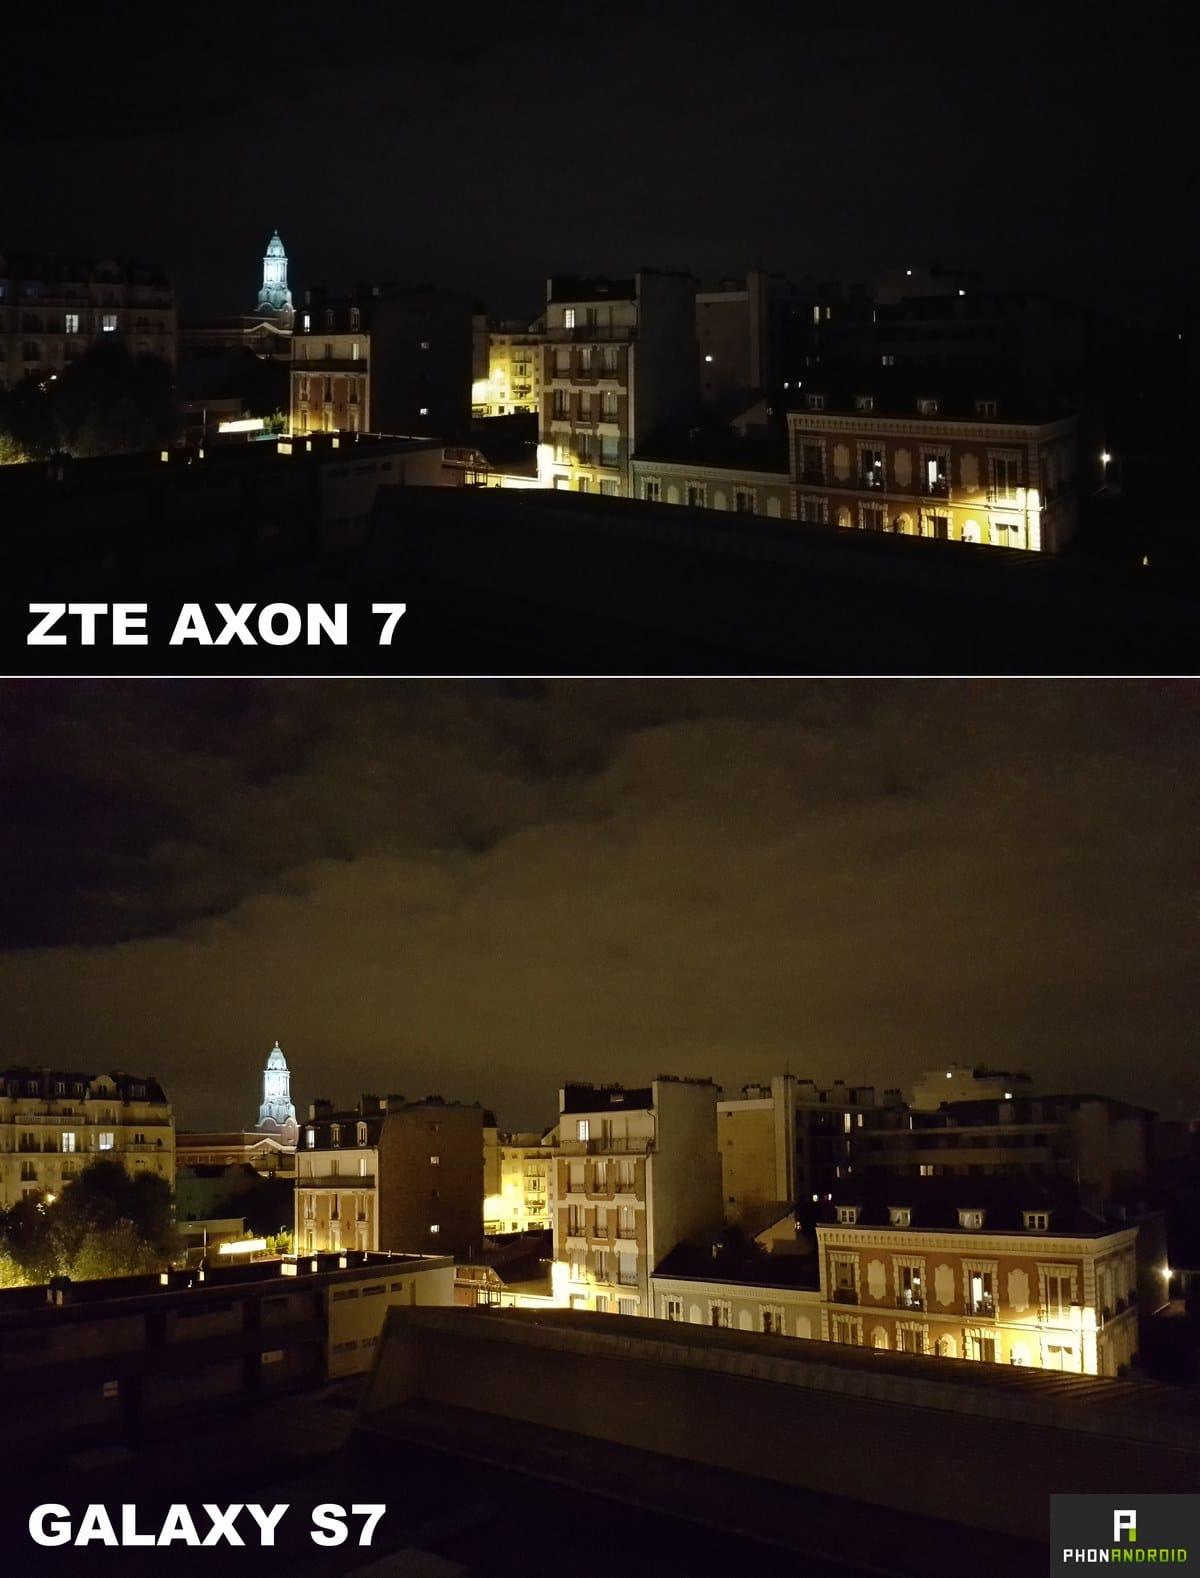 zte axon 7 photo nuit